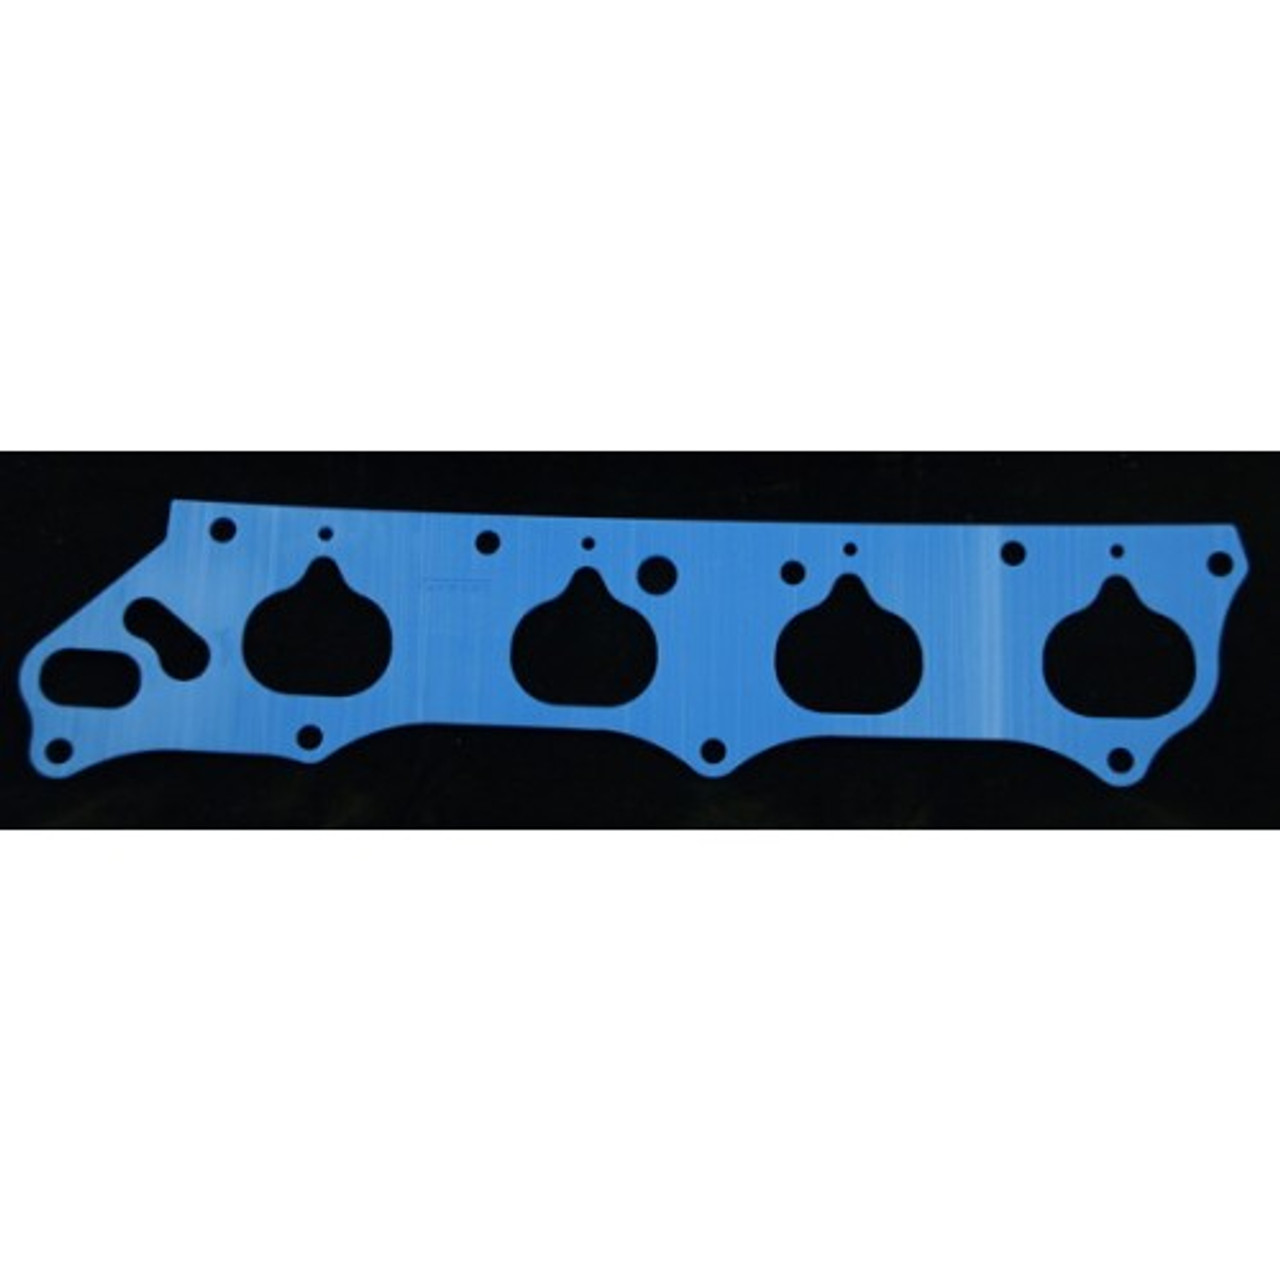 Hondata - Heatshield Intake Manifold Gasket (K20Z3, K24A2, K24A4, K20Z4)